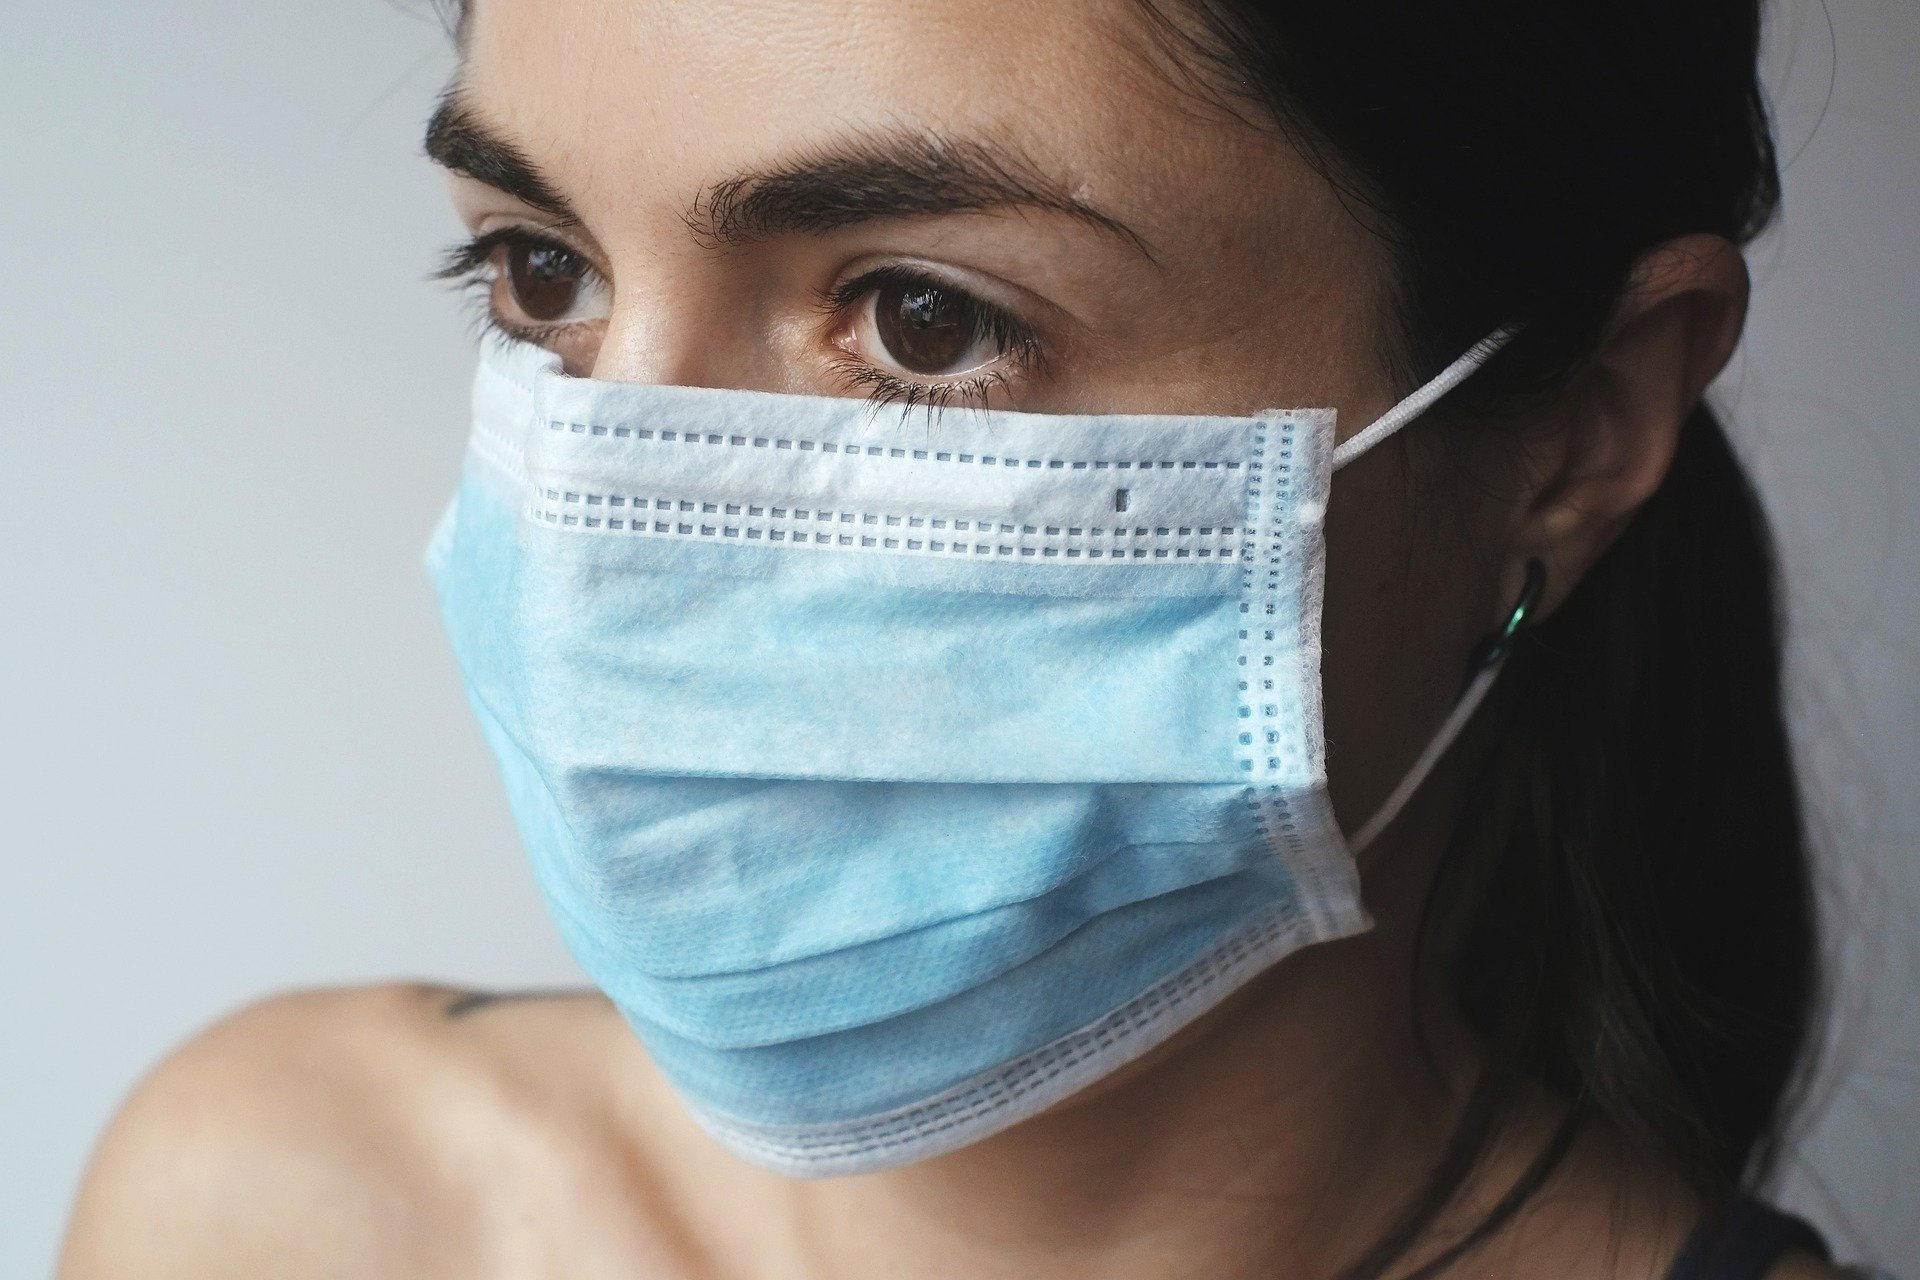 Município Macedense já encomendou mais máscaras e gel desinfetante